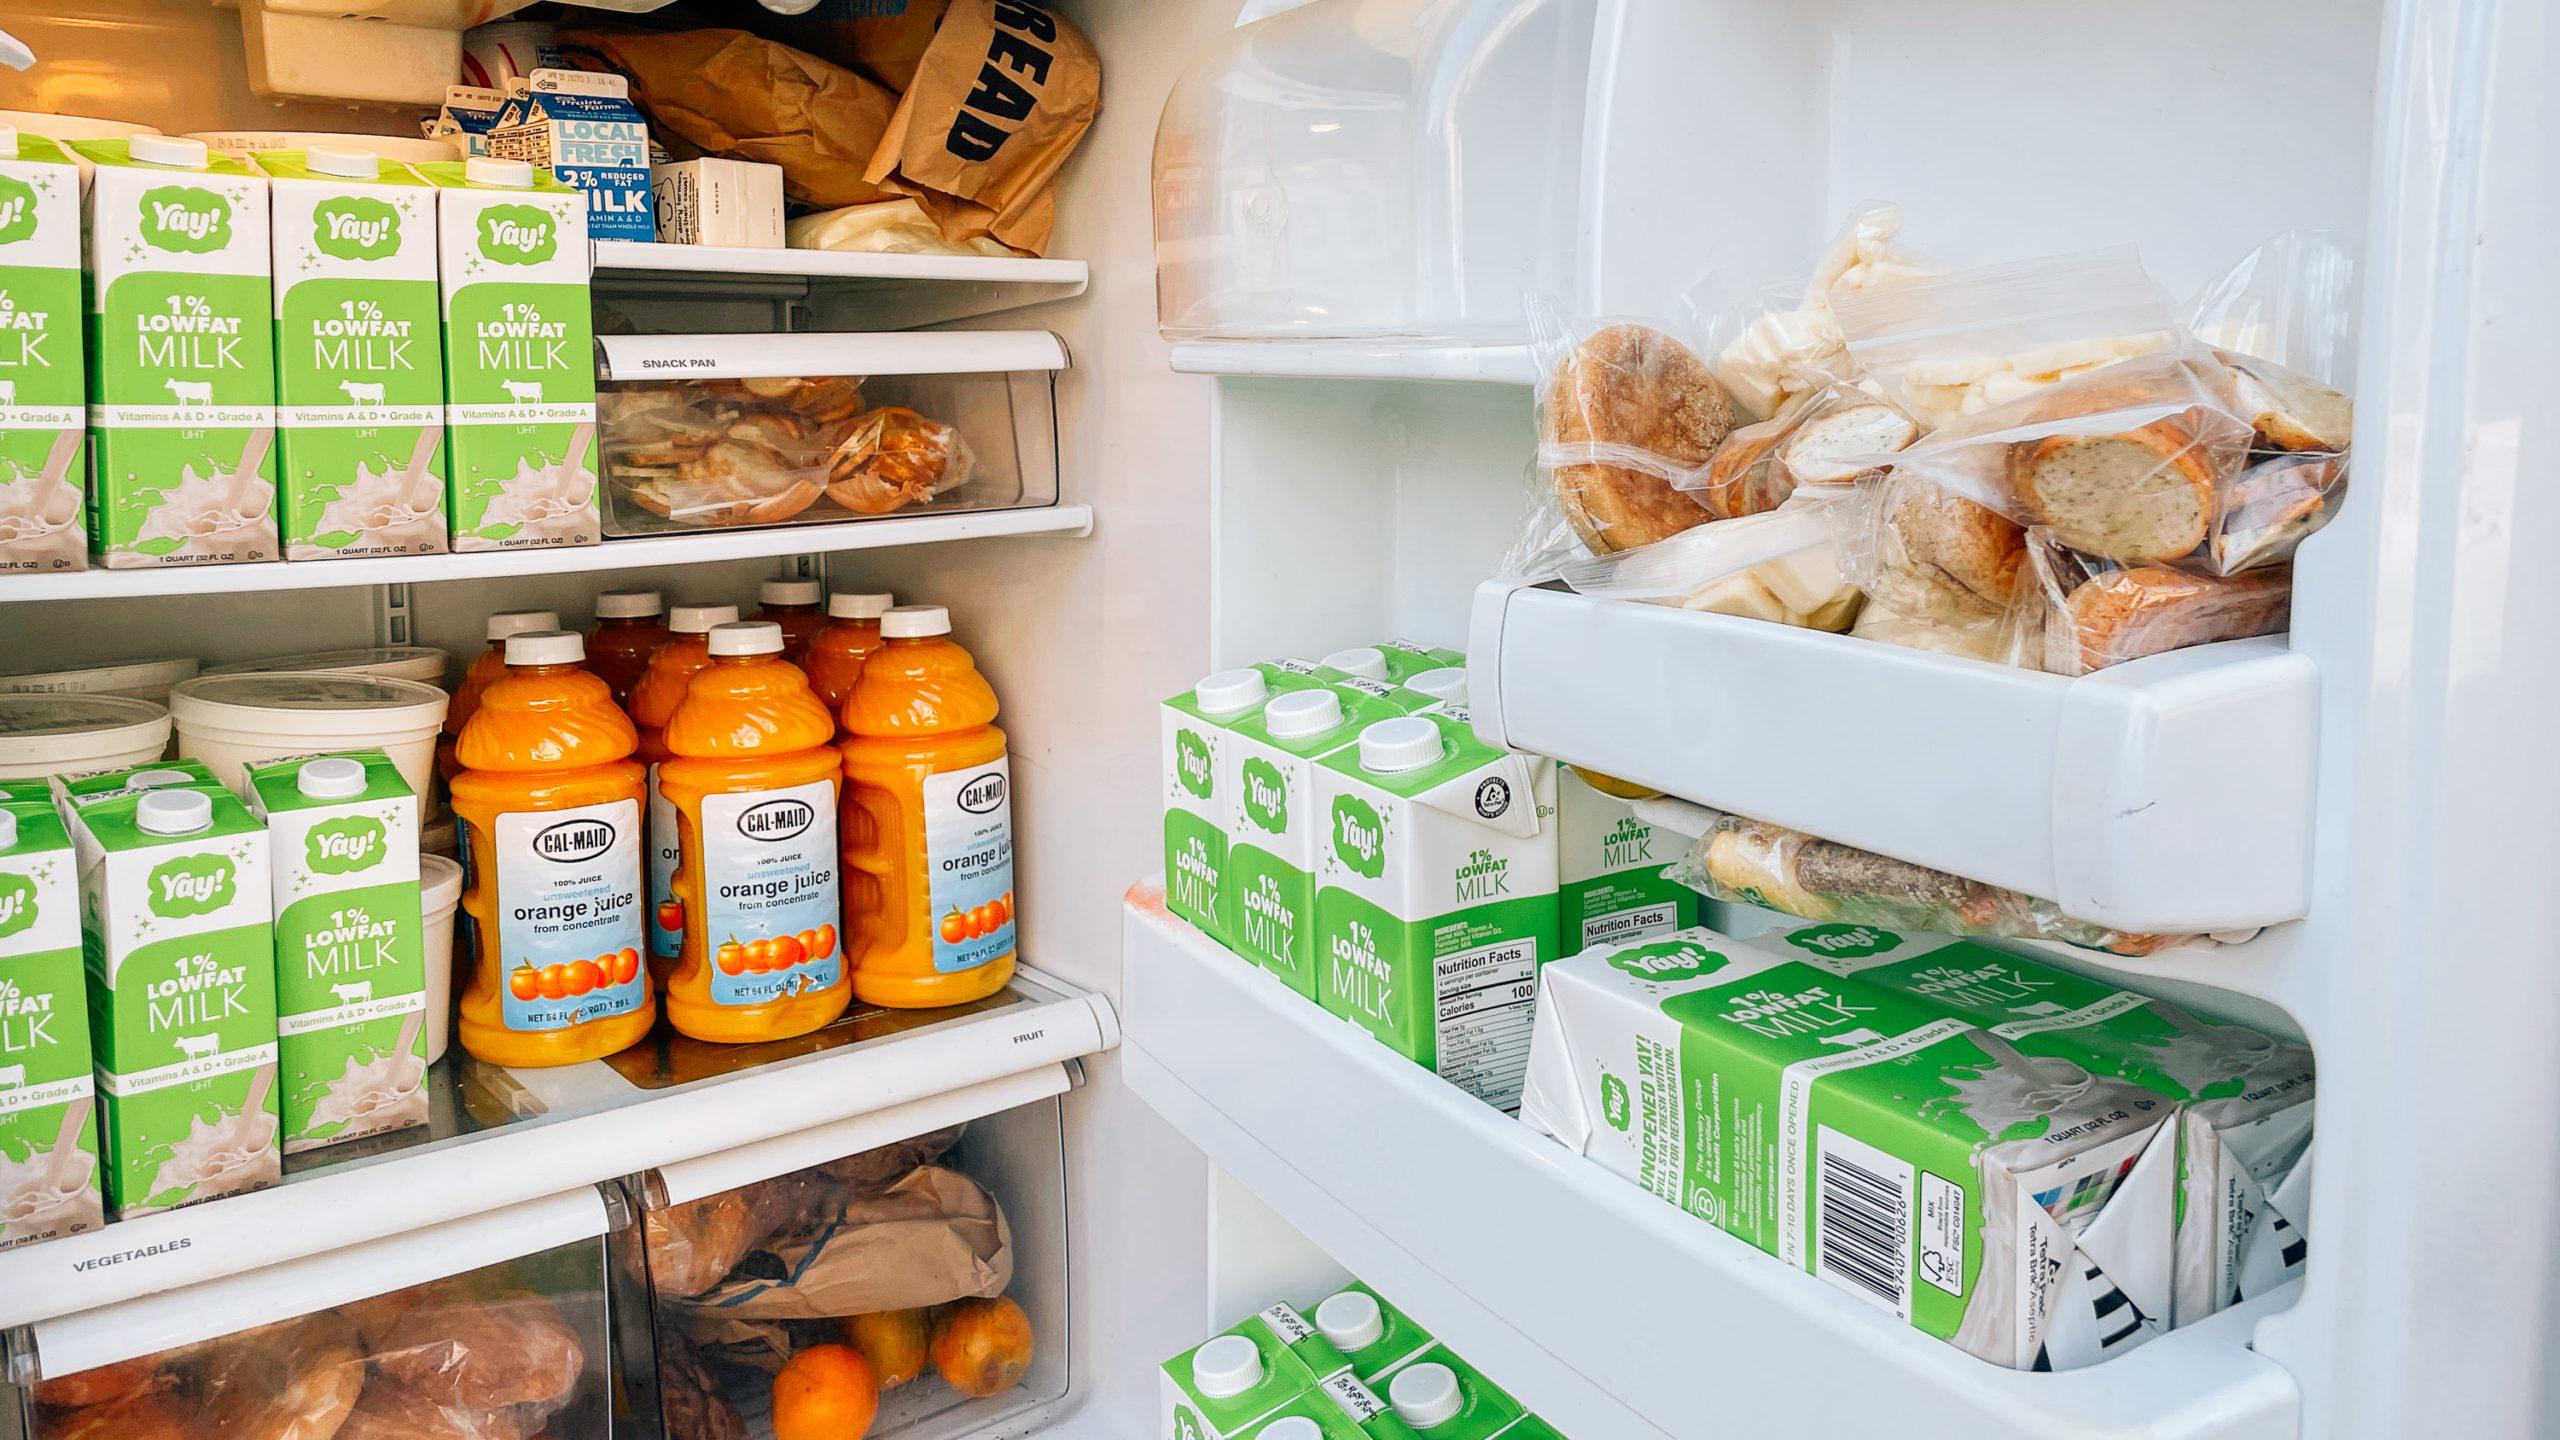 A public fridge door open, filled with free food